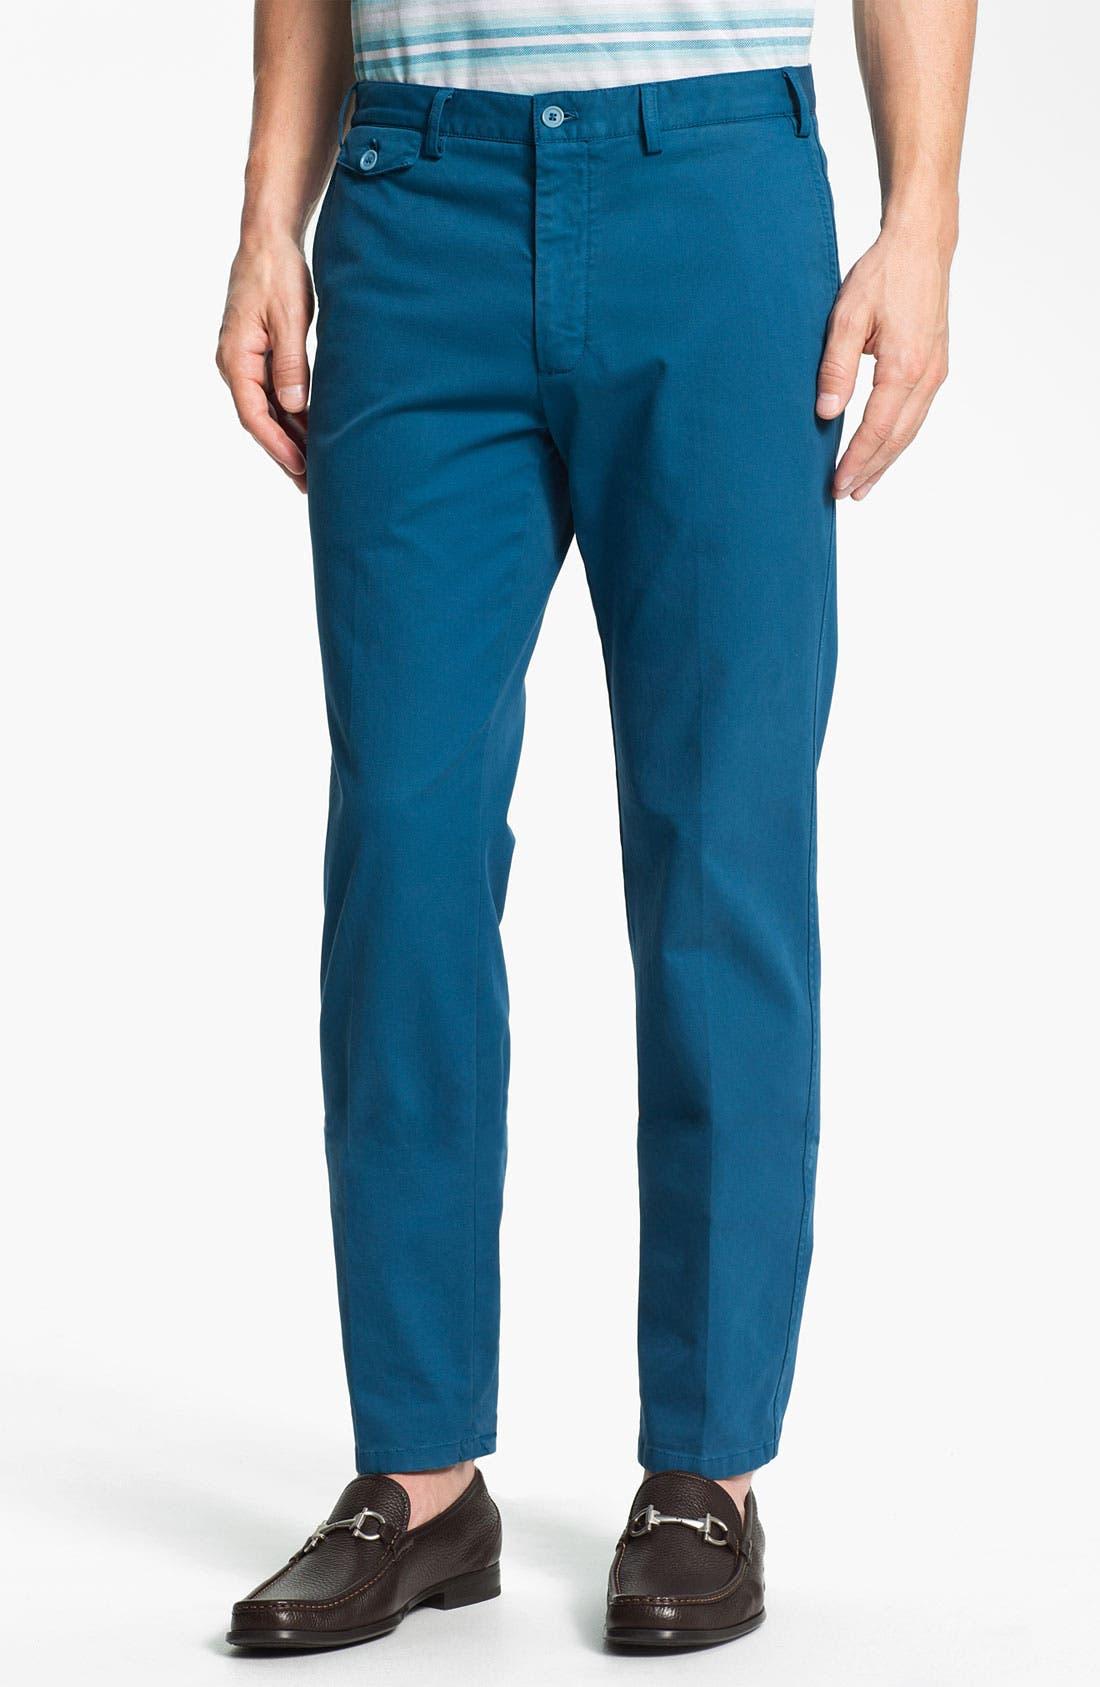 Alternate Image 1 Selected - Salvatore Ferragamo Flat Front Pants